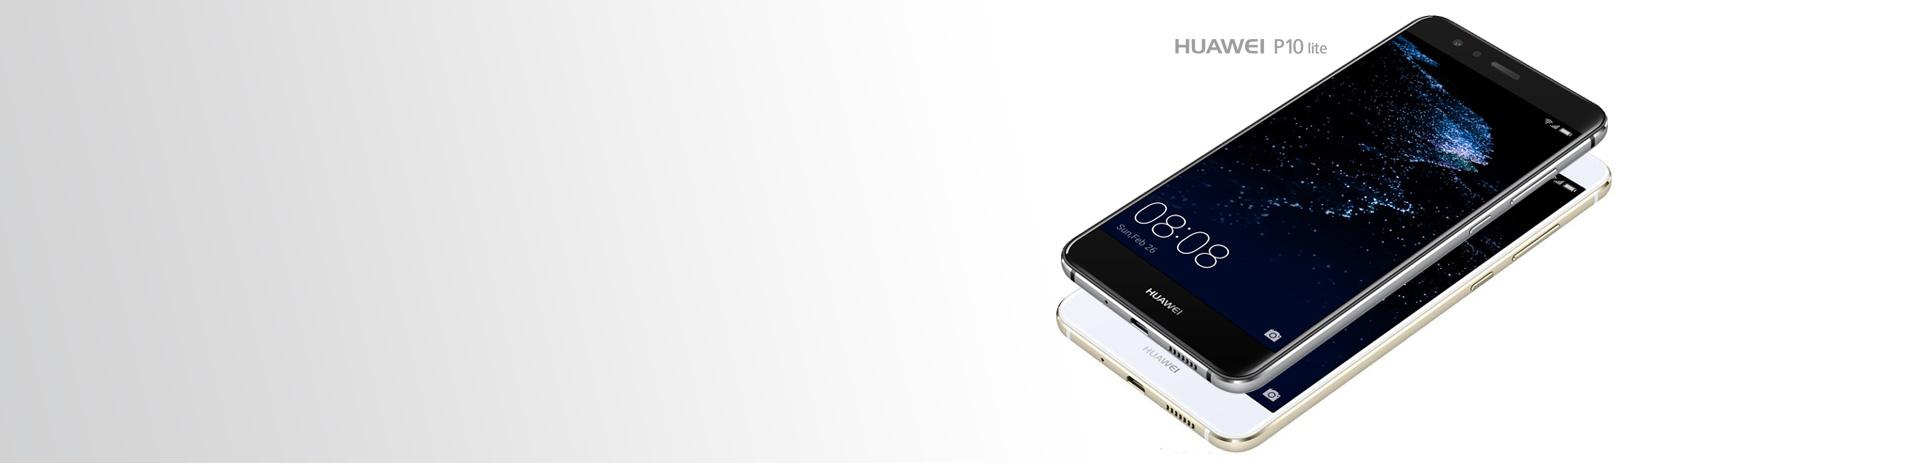 Huawei P10 Lite - Next Handy des Monats Juni